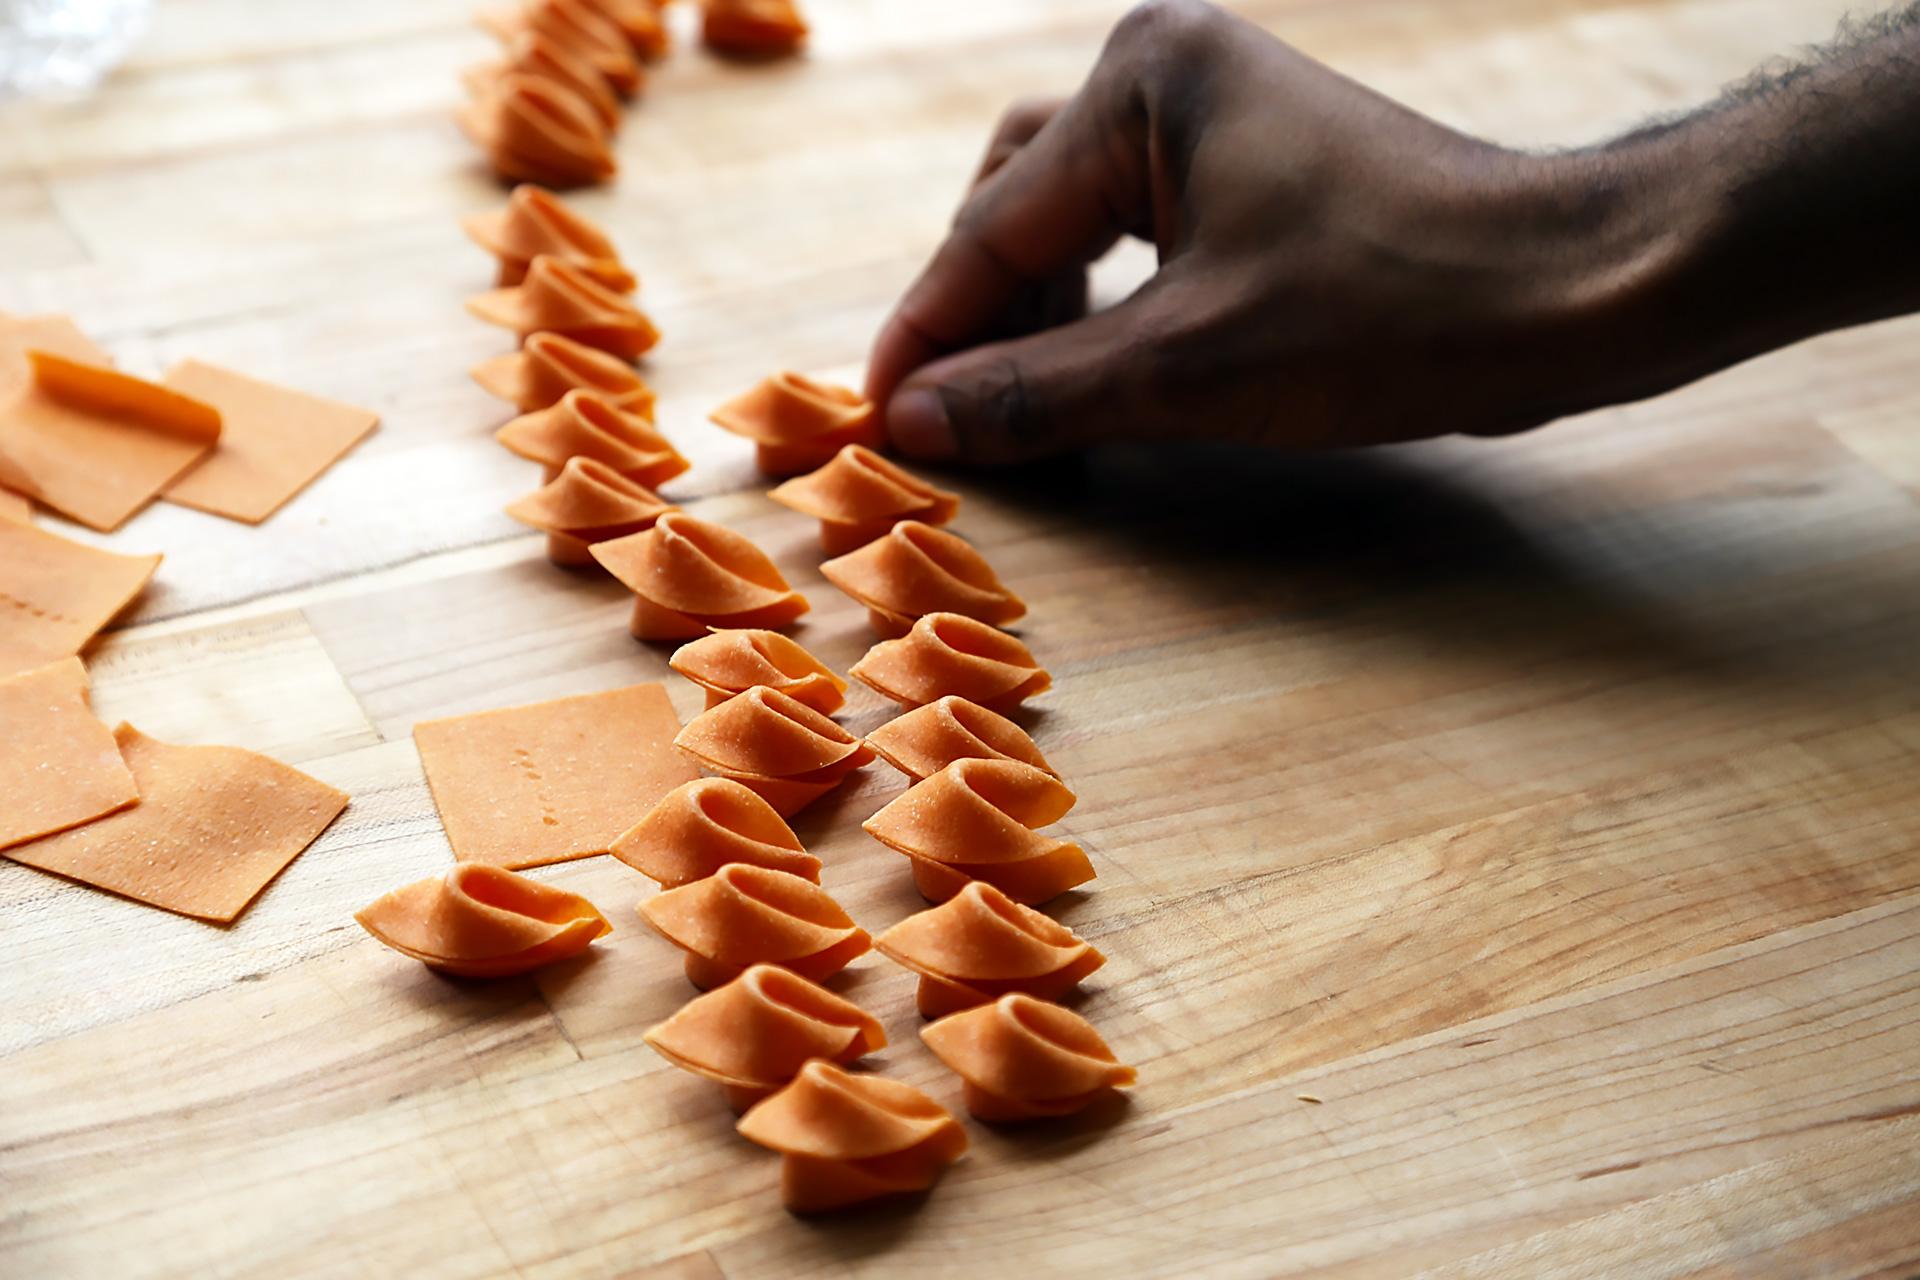 Housemade tomato chele pasta.